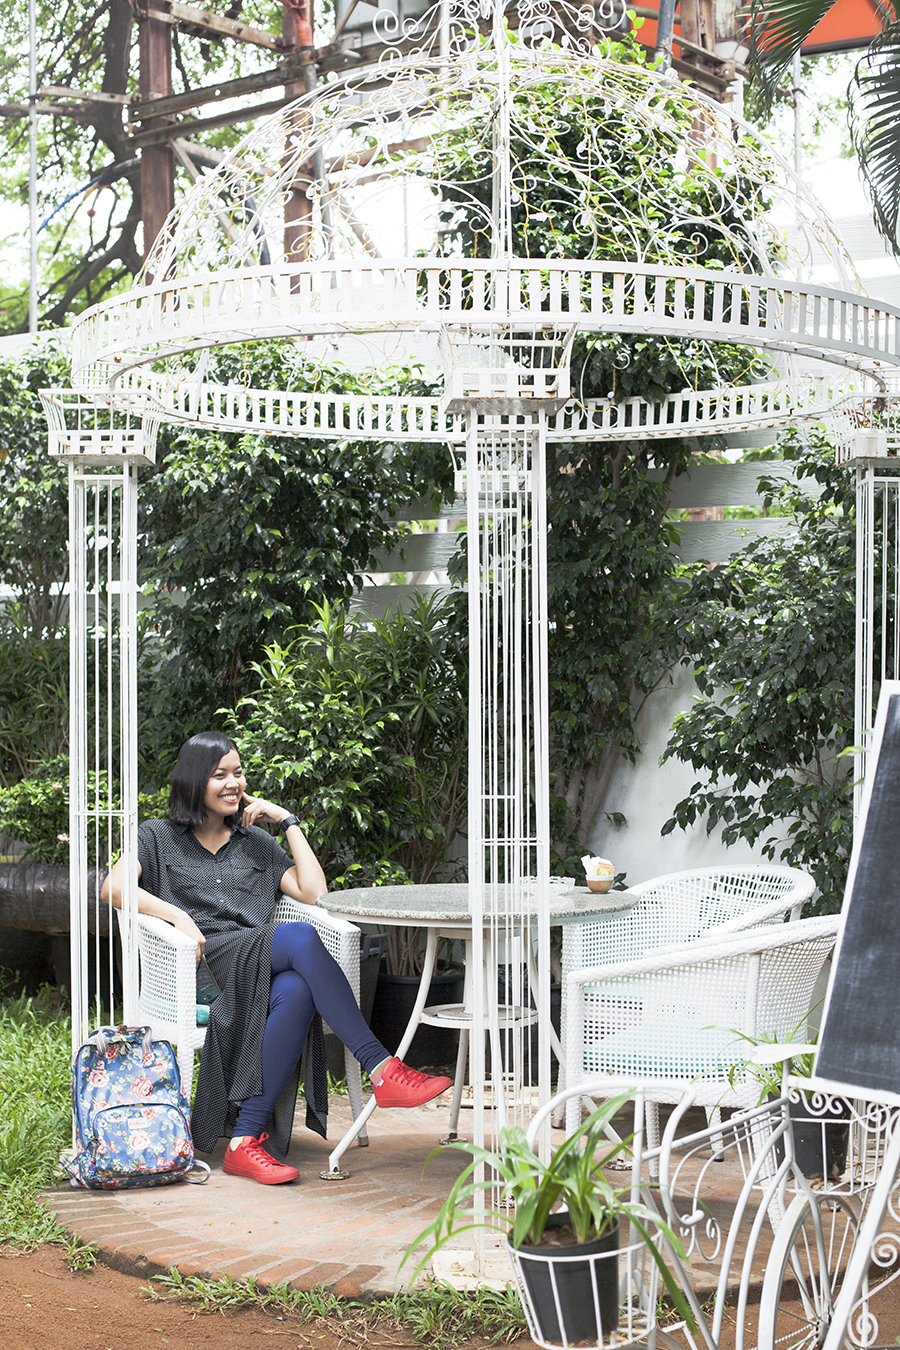 Shasha lounging at the garden pavillion at The Brew Room, Chennai India.